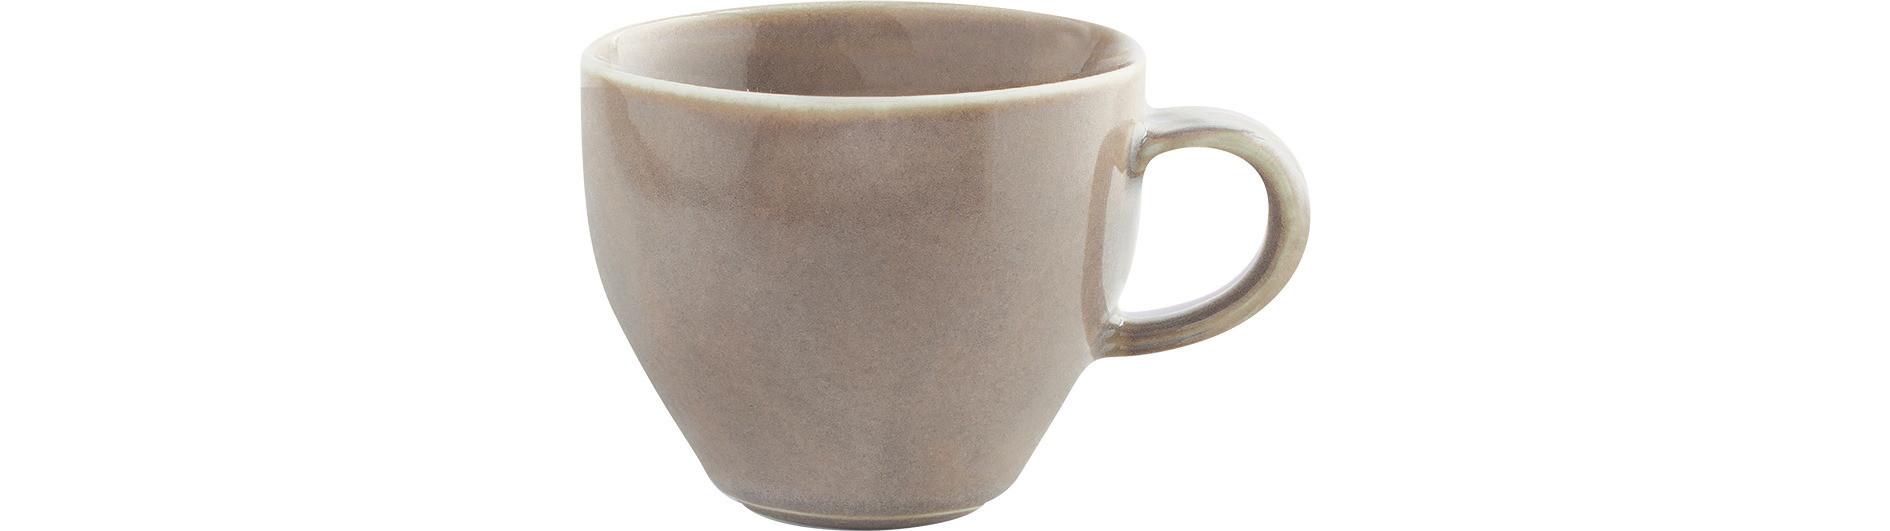 Homestyle, Milchkaffeetasse ø 101 mm / 0,30 l desert sand